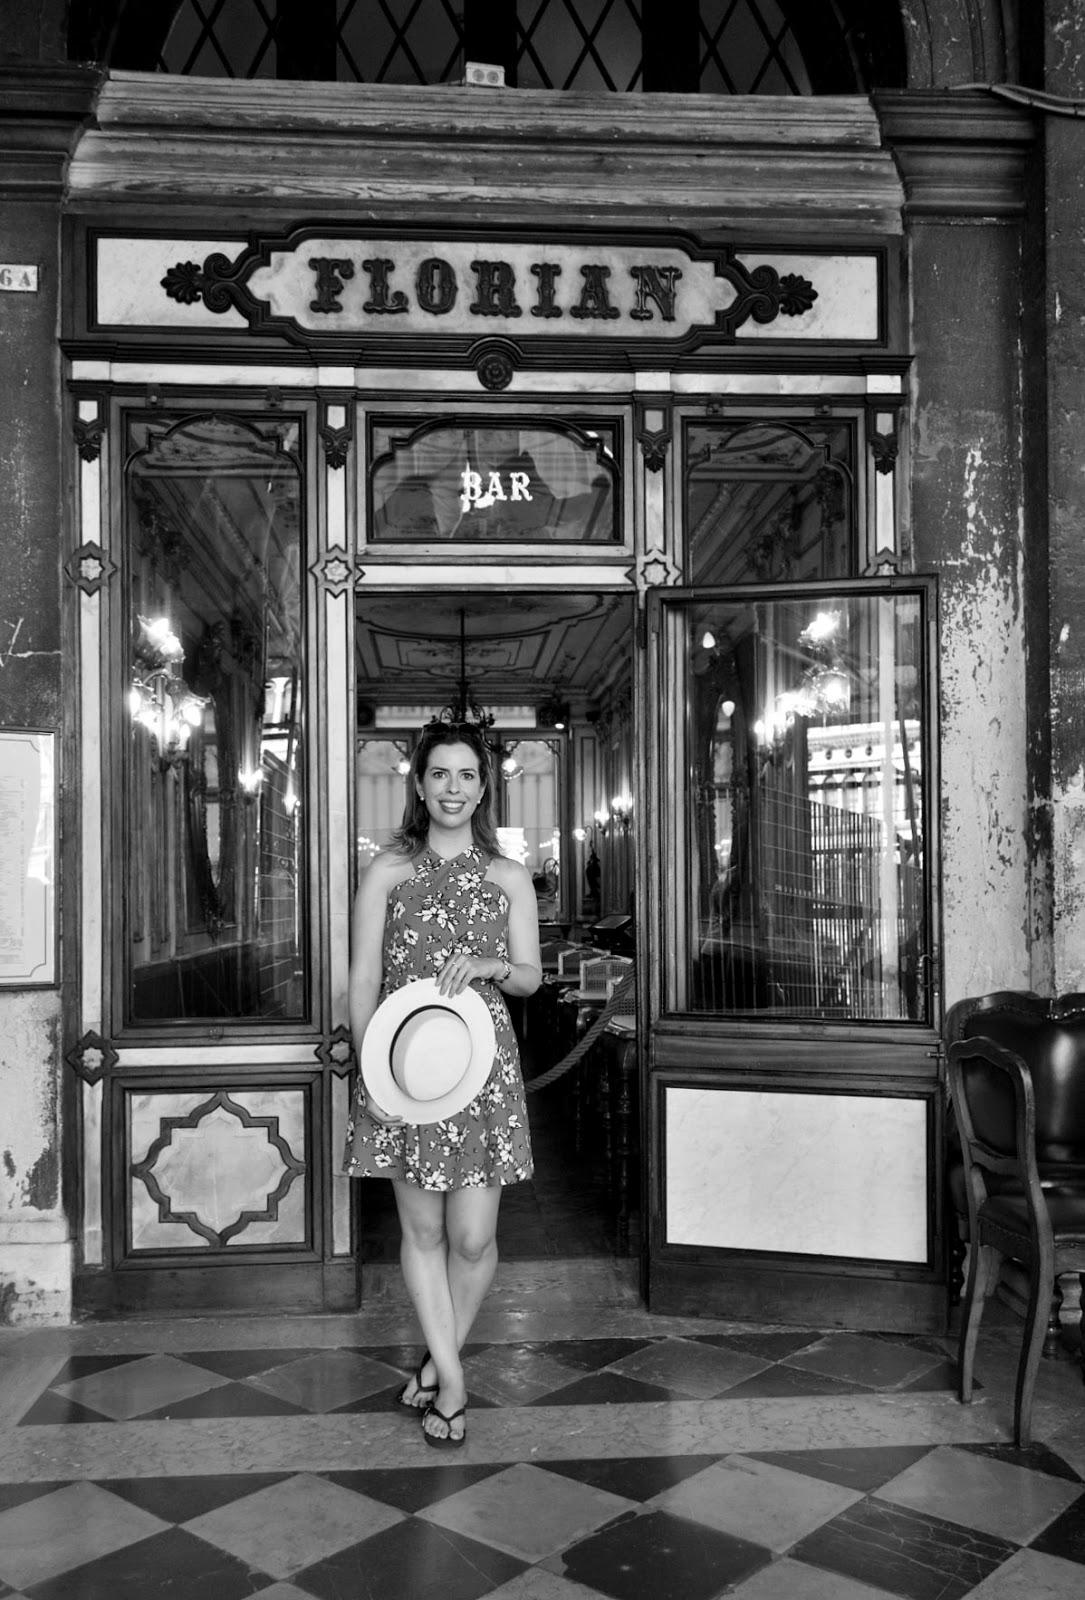 cafe florian piazza san marco venice italy